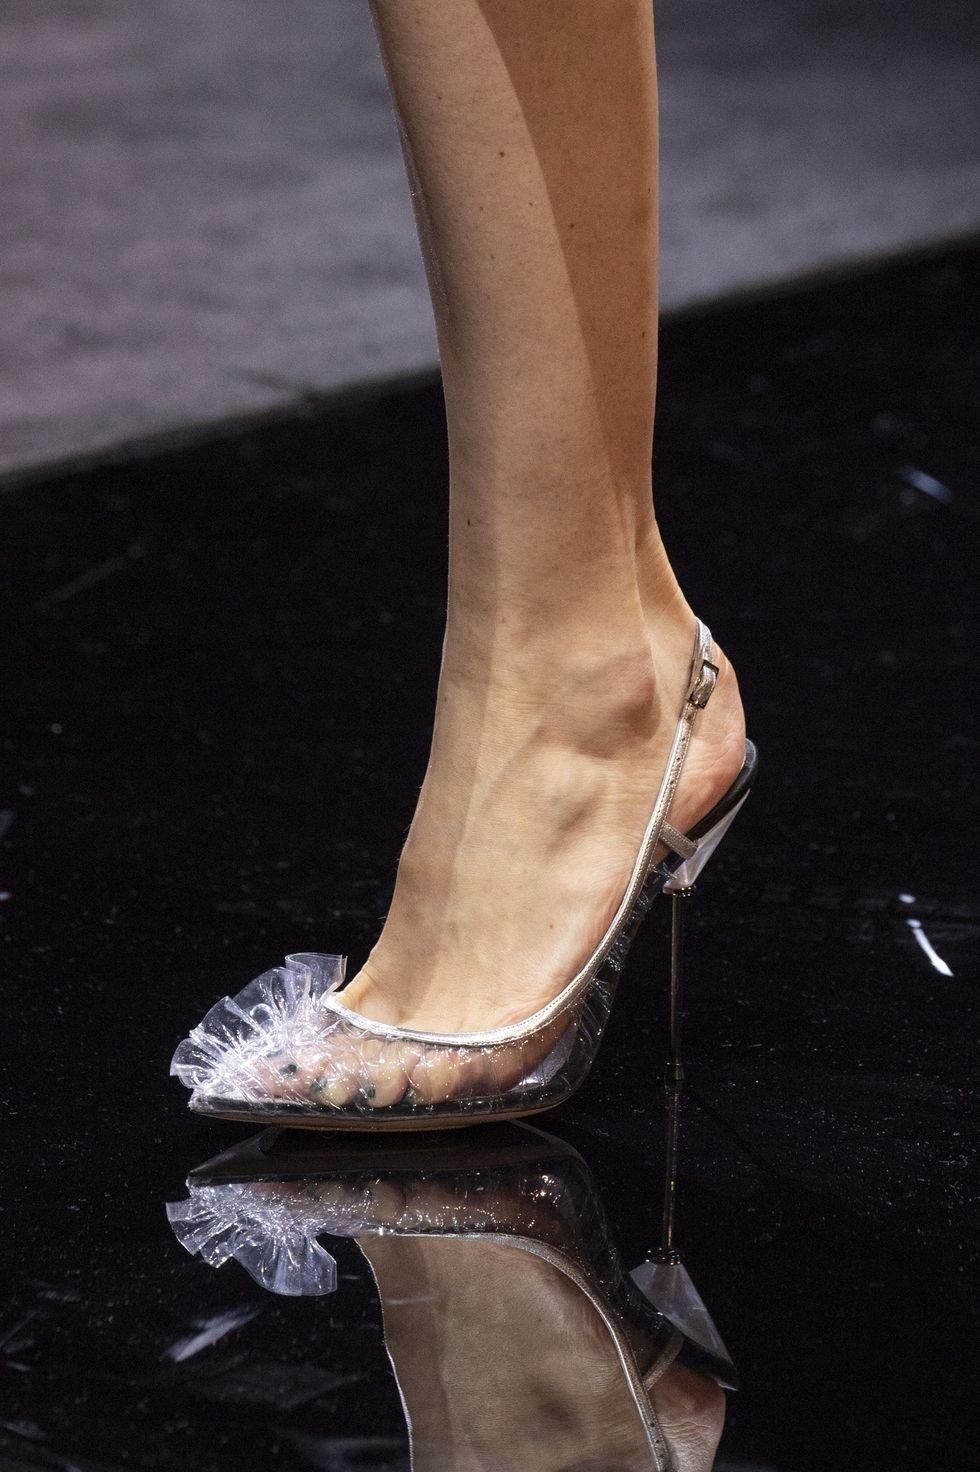 0cd1d4ffe Chanel shoes حذاء احذية رائجة ربيع 2019 plastic احذية بلاستيكية giorgio  Armani جورجيو ارماني